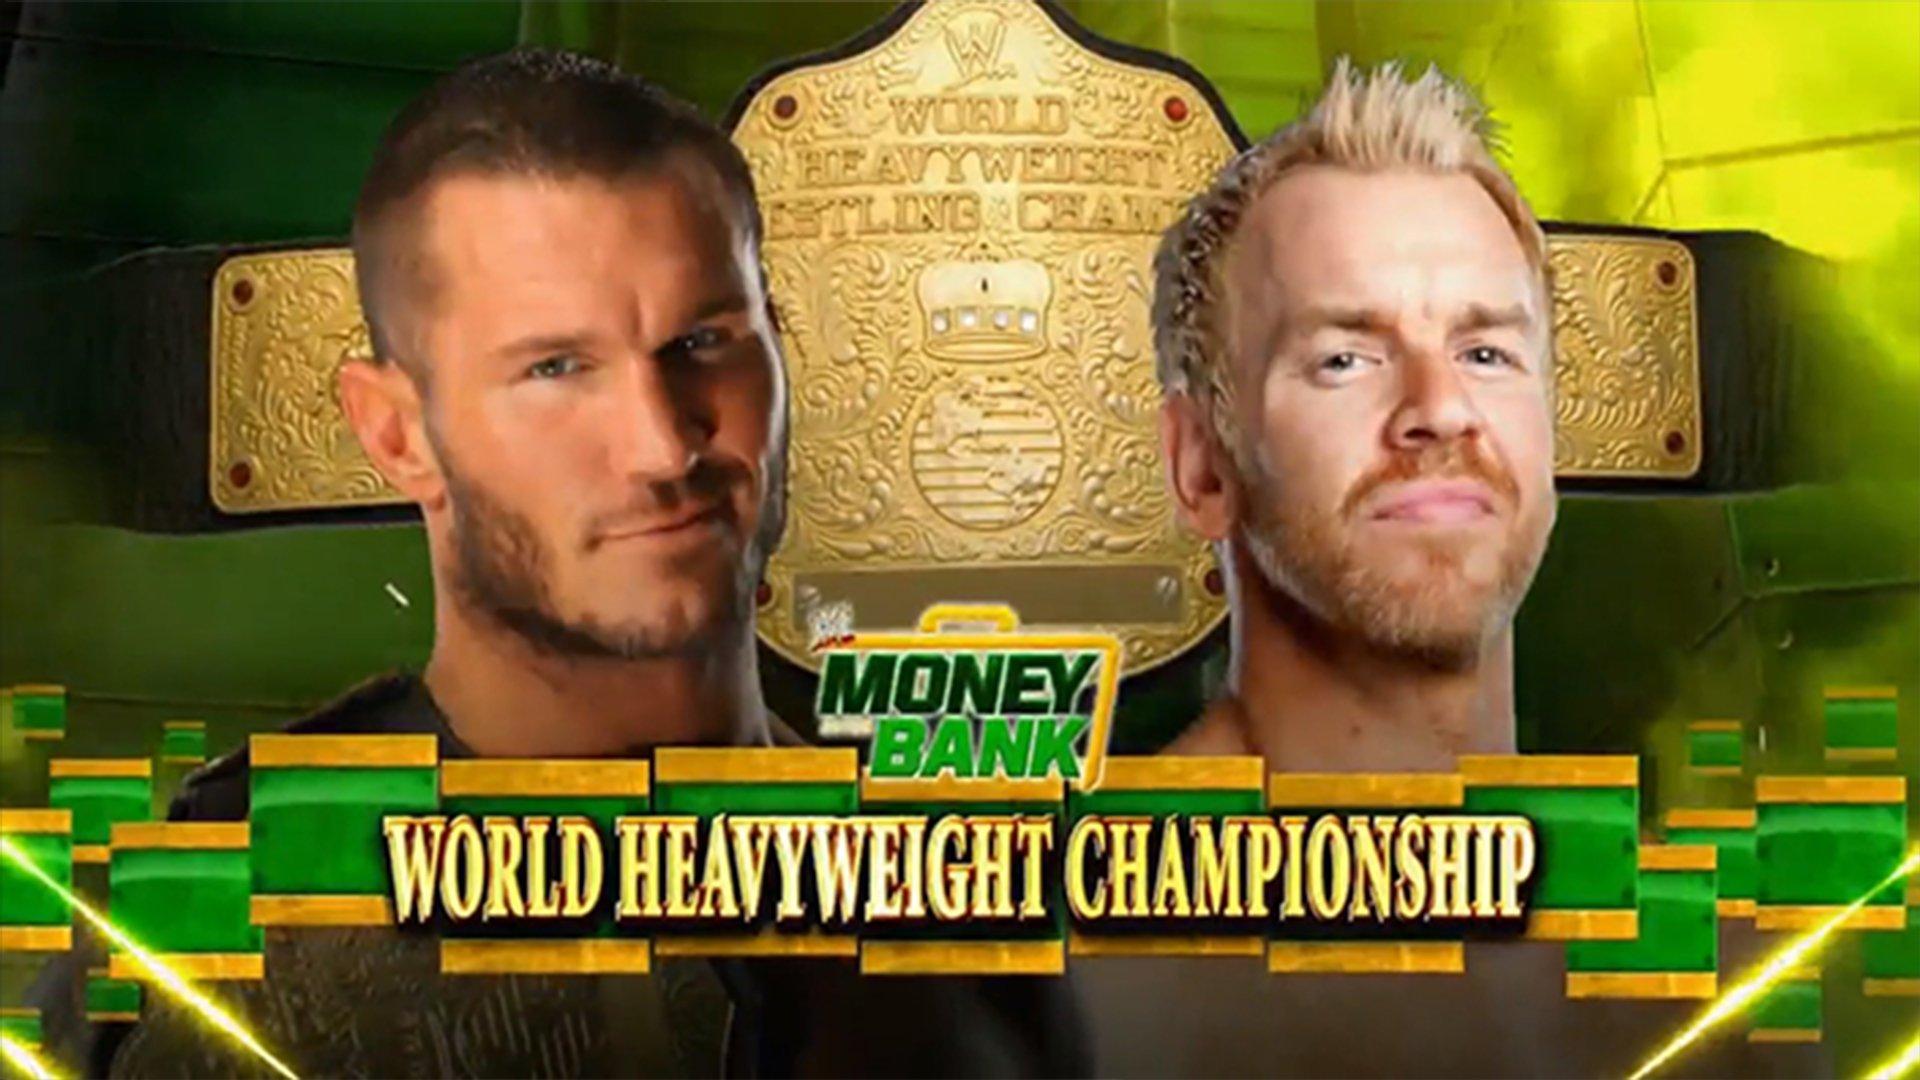 Daniel Bryan won the SmackDown Money in the Bank Ladder Match | WWE